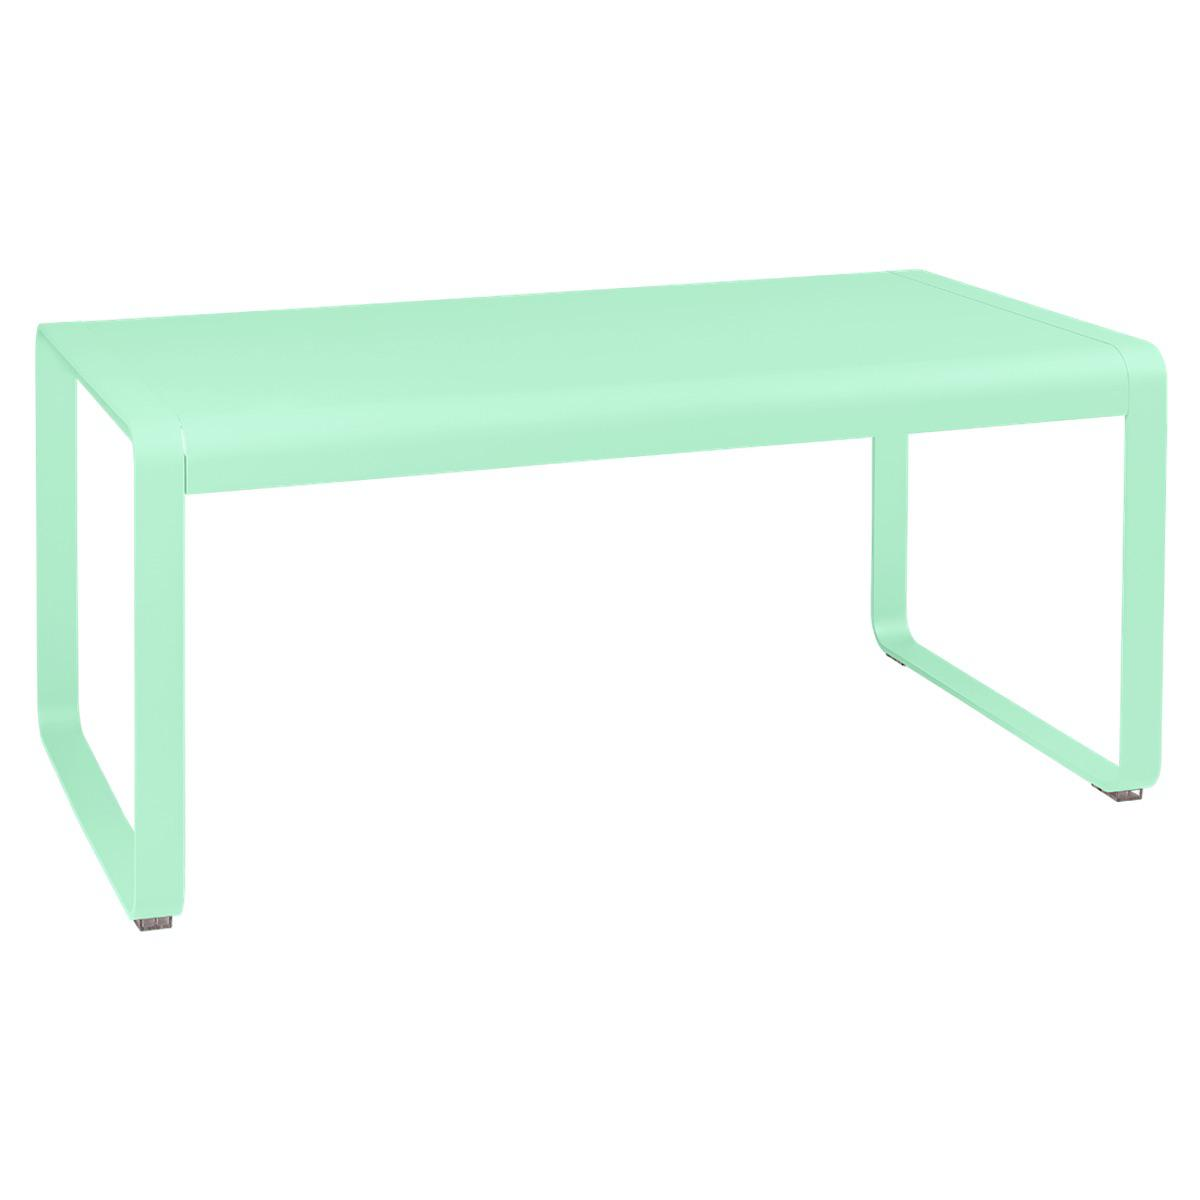 Table de jardin mi-hauteur 80x140cm BELLEVIE Fermob vert opaline